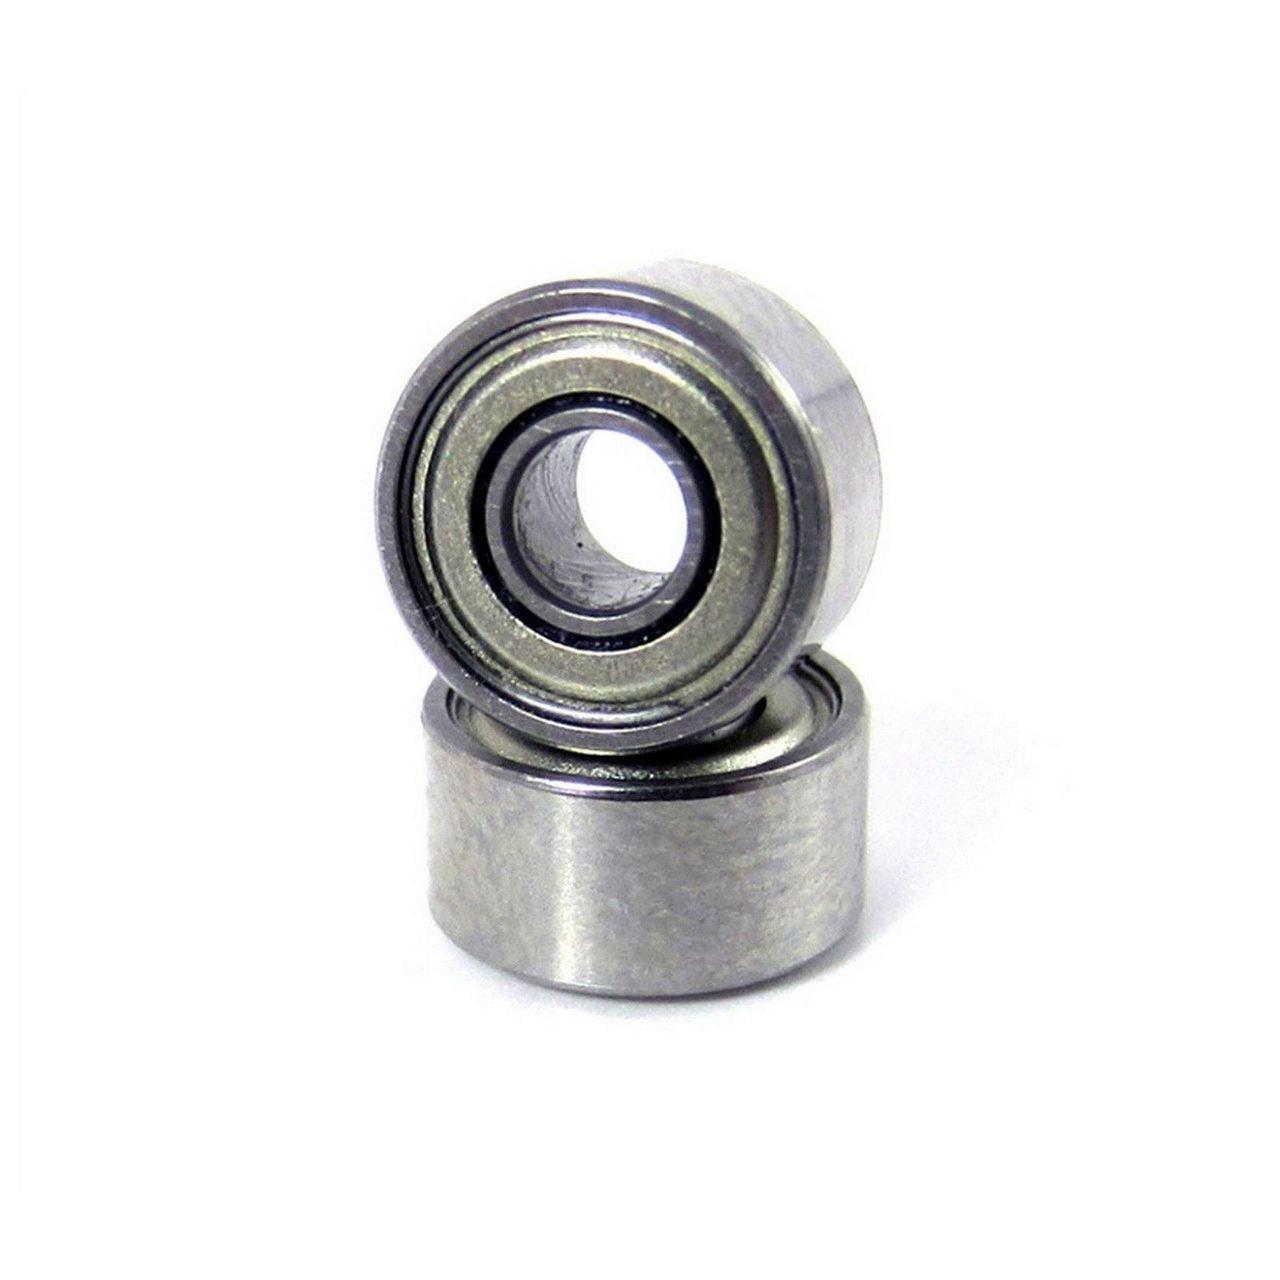 TRB RC 3x8x4mm Precision Ceramic Ball Bearings Metal Shields (2)